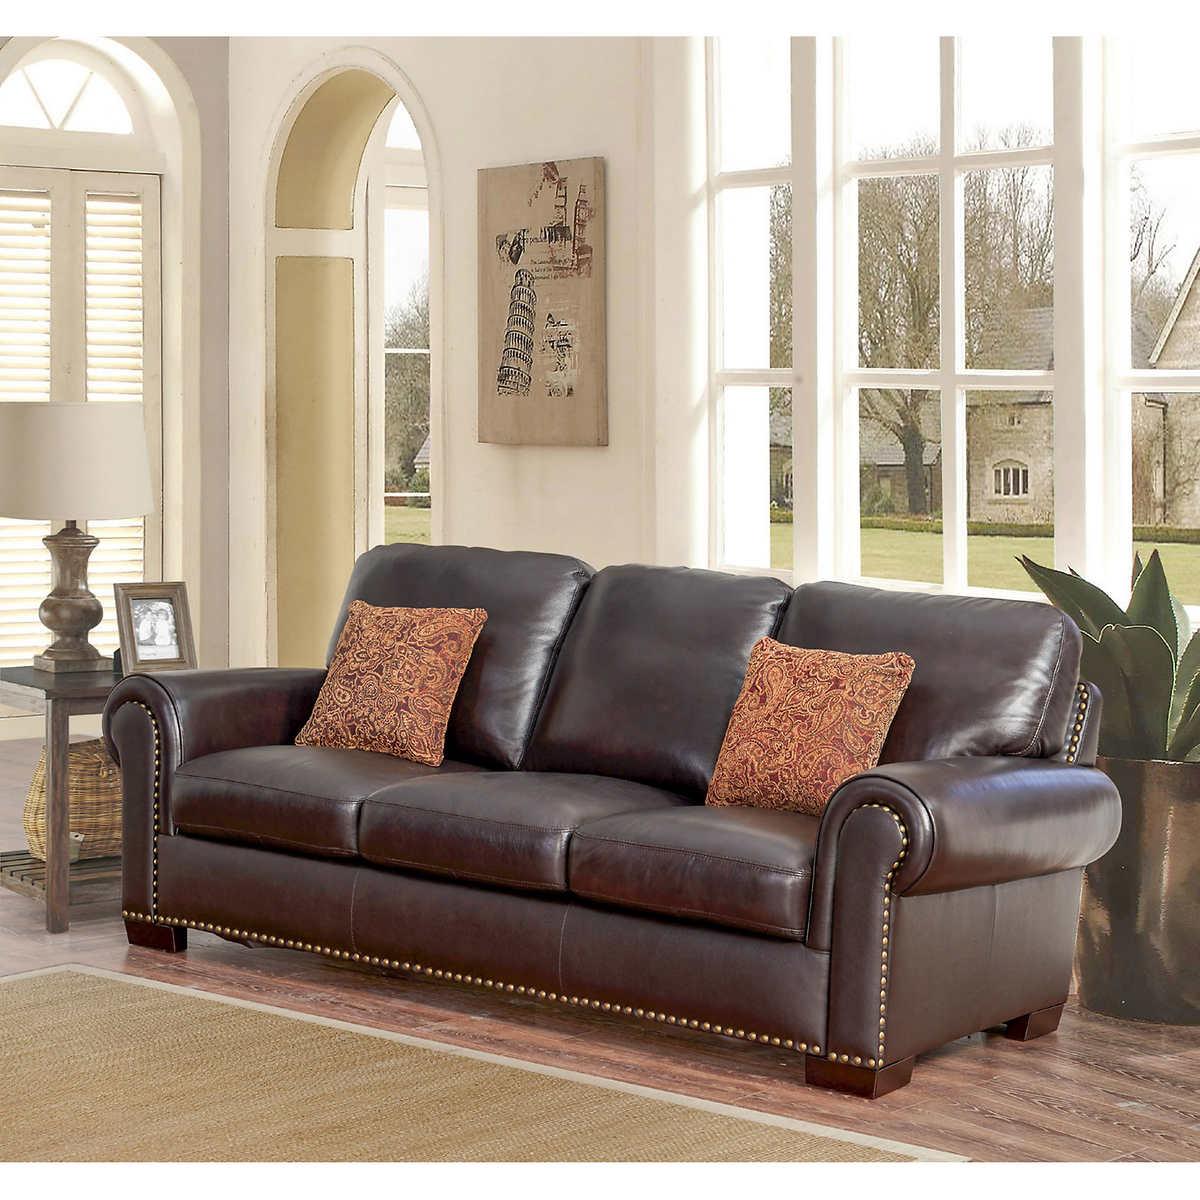 ... Top Grain Leather Sofa. 1 1